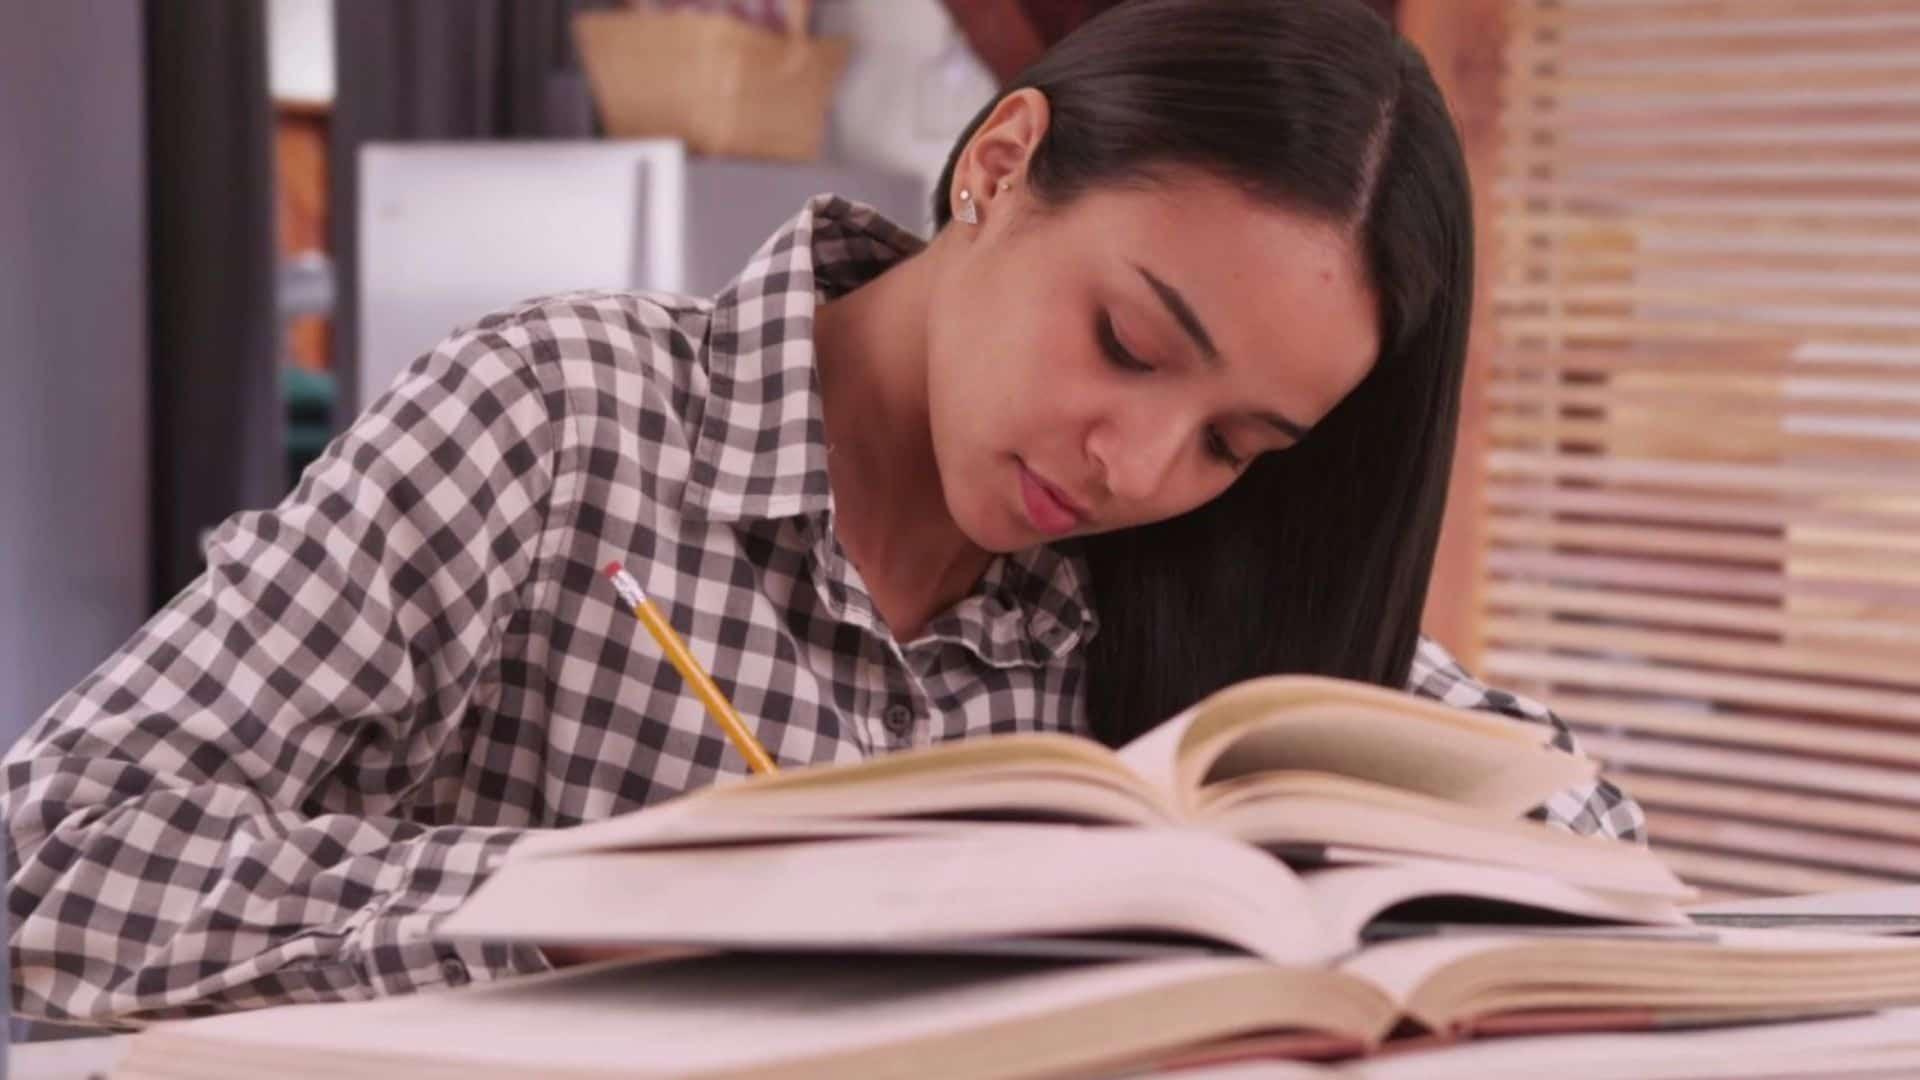 Girl Boring Homeword